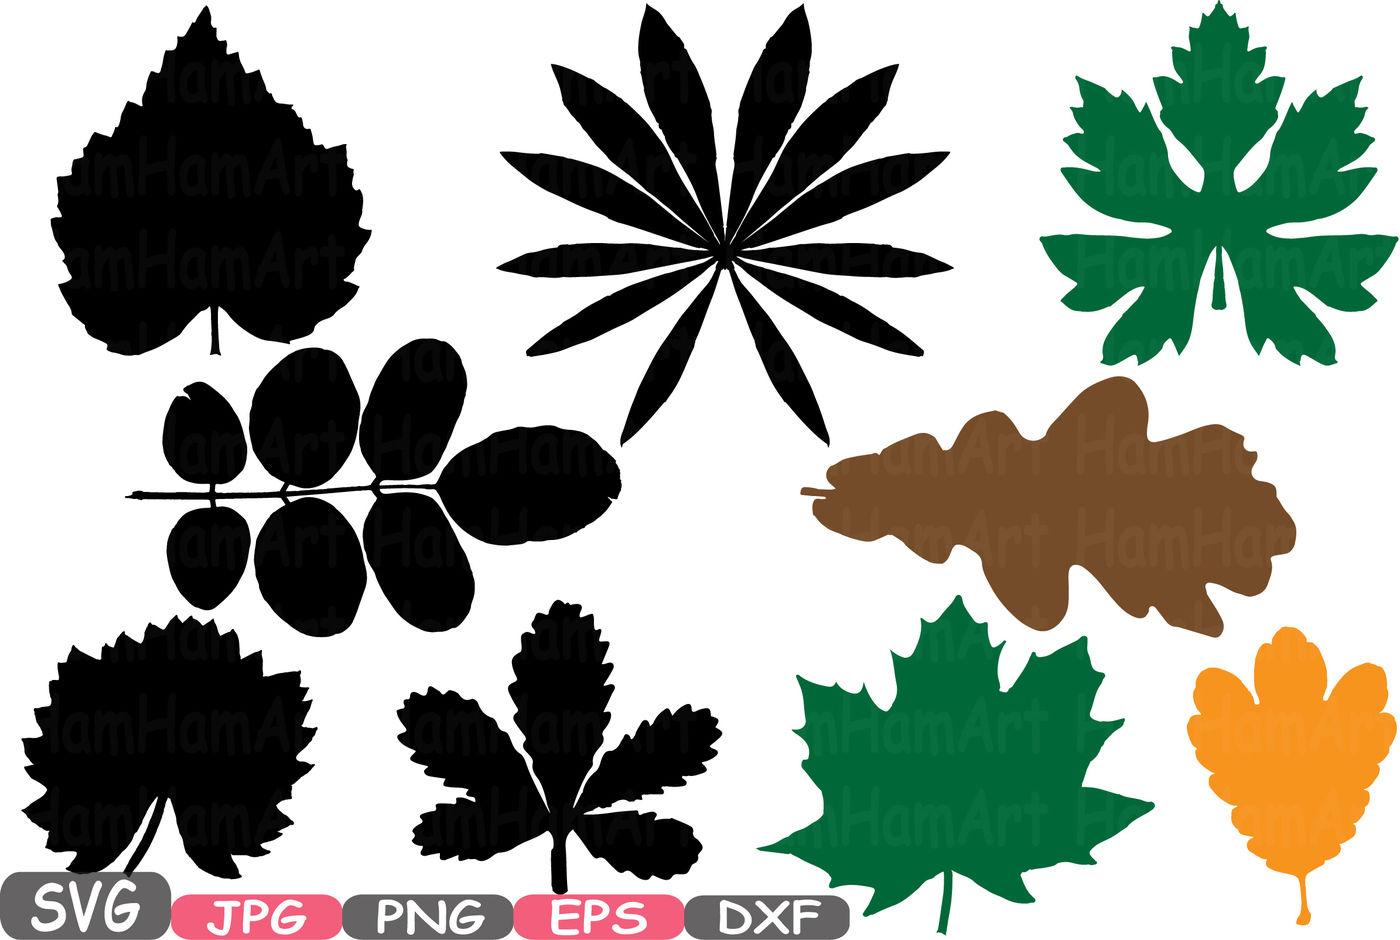 Silhouette Leaf Design